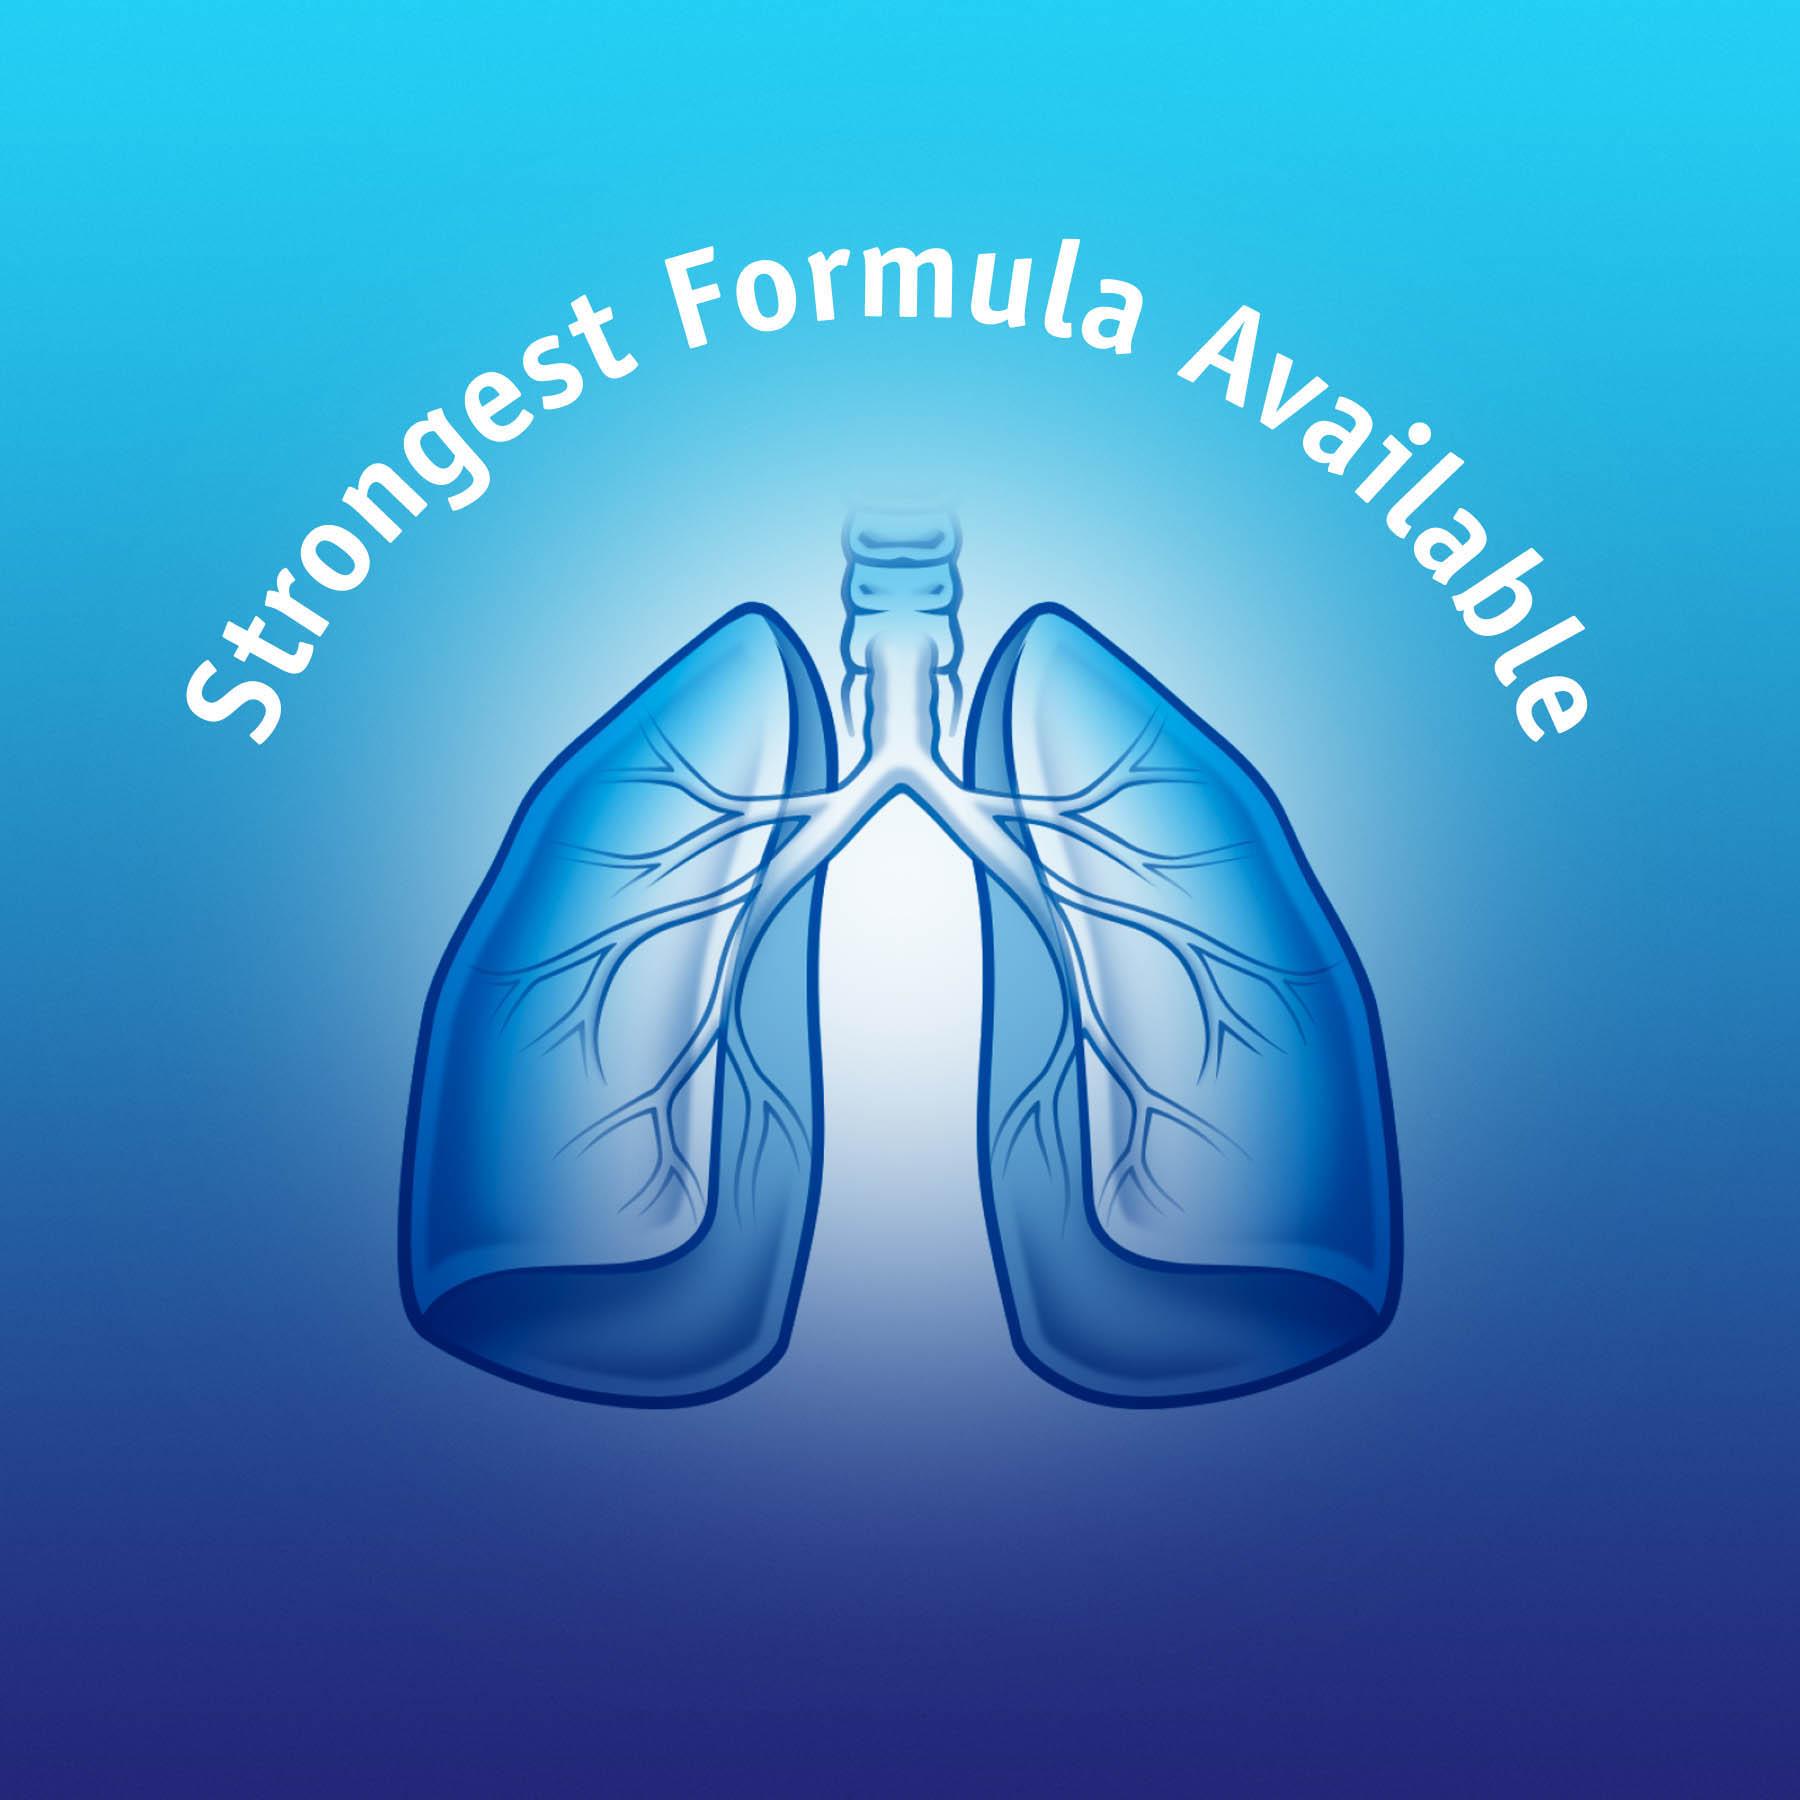 Bronkaid Strongest Formula Available Badge